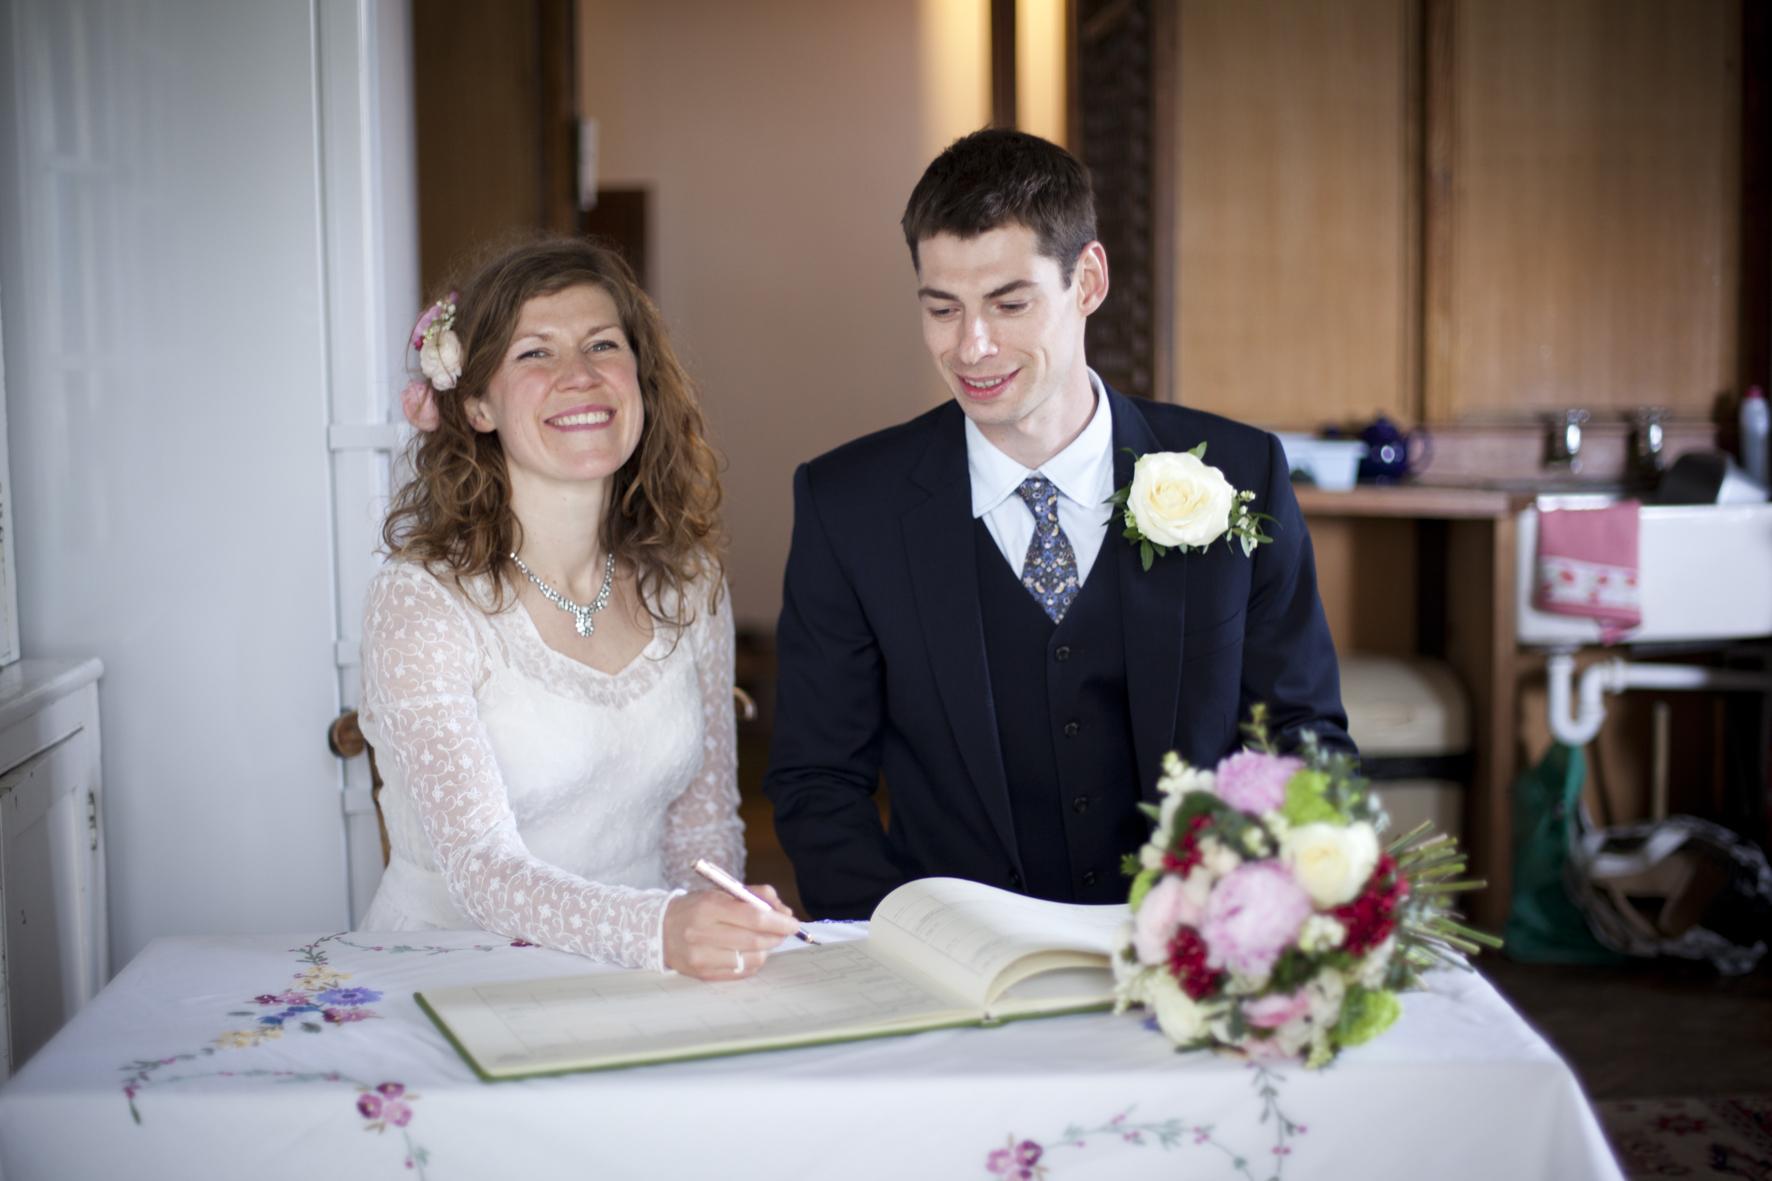 Wedding example_M&P__MG_3506_Claudia Leisinger.jpg